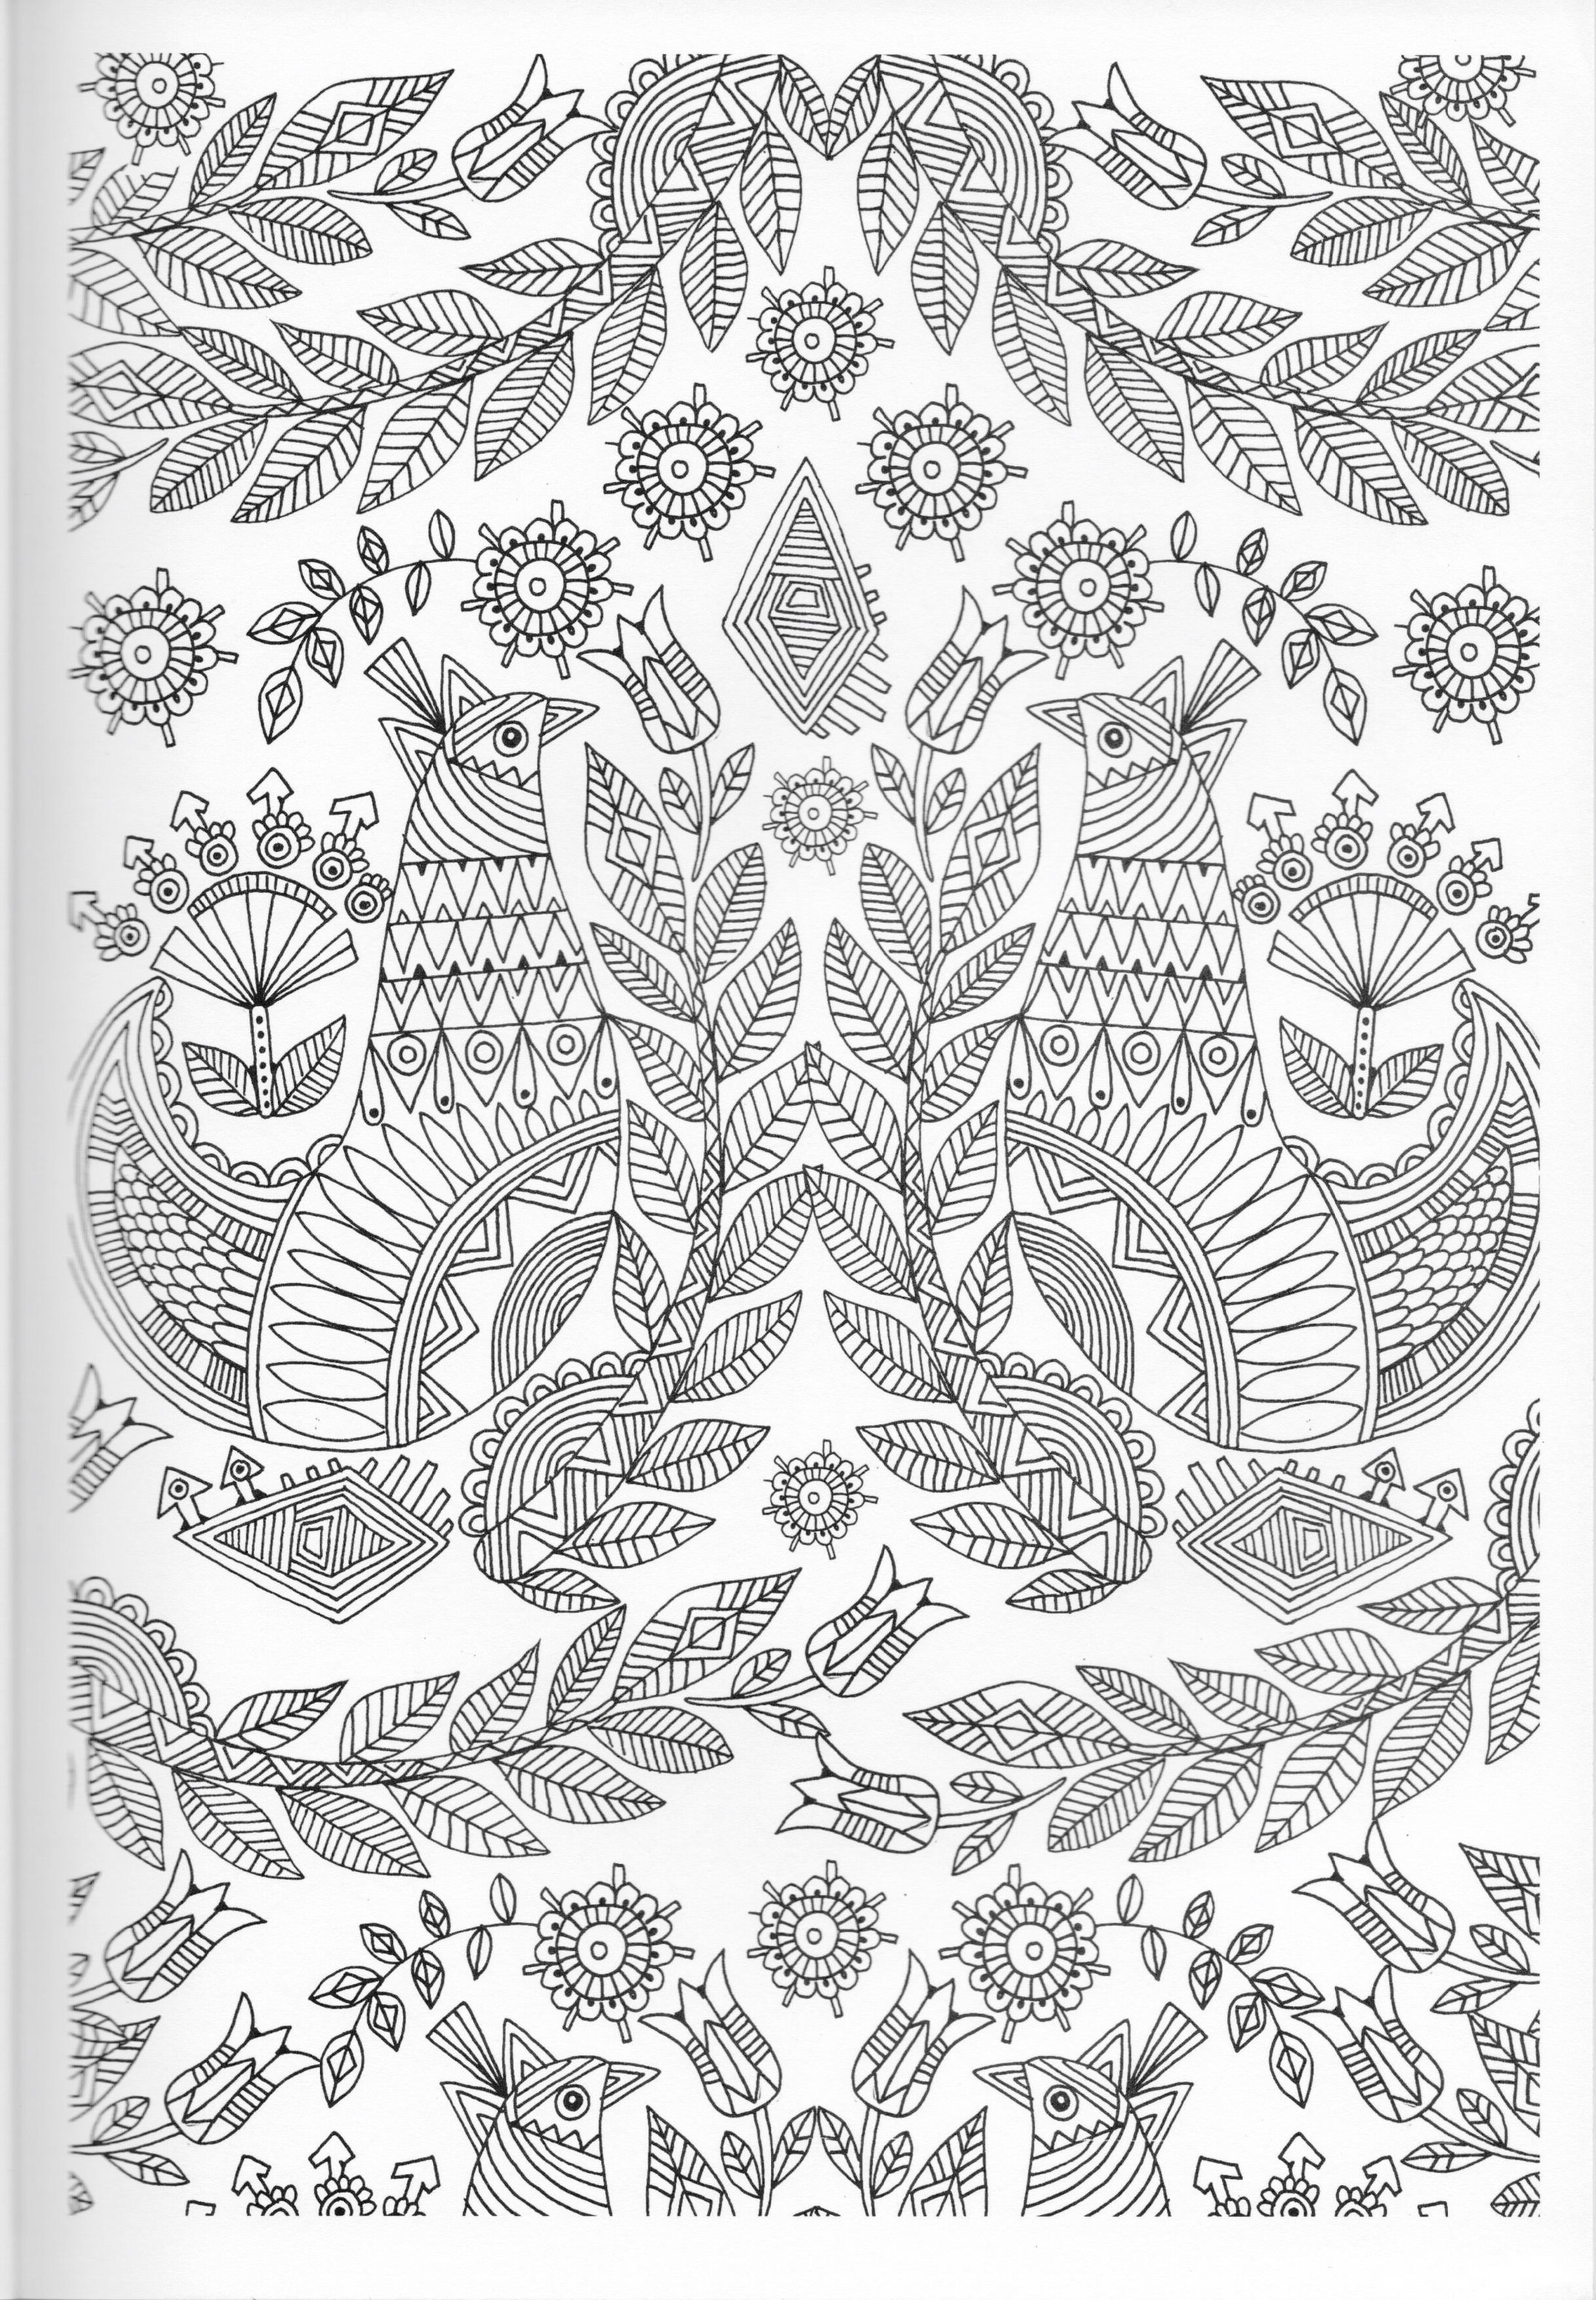 Scandinavian Coloring Book Pg 9 | Color pages, Stencils, Templates ...